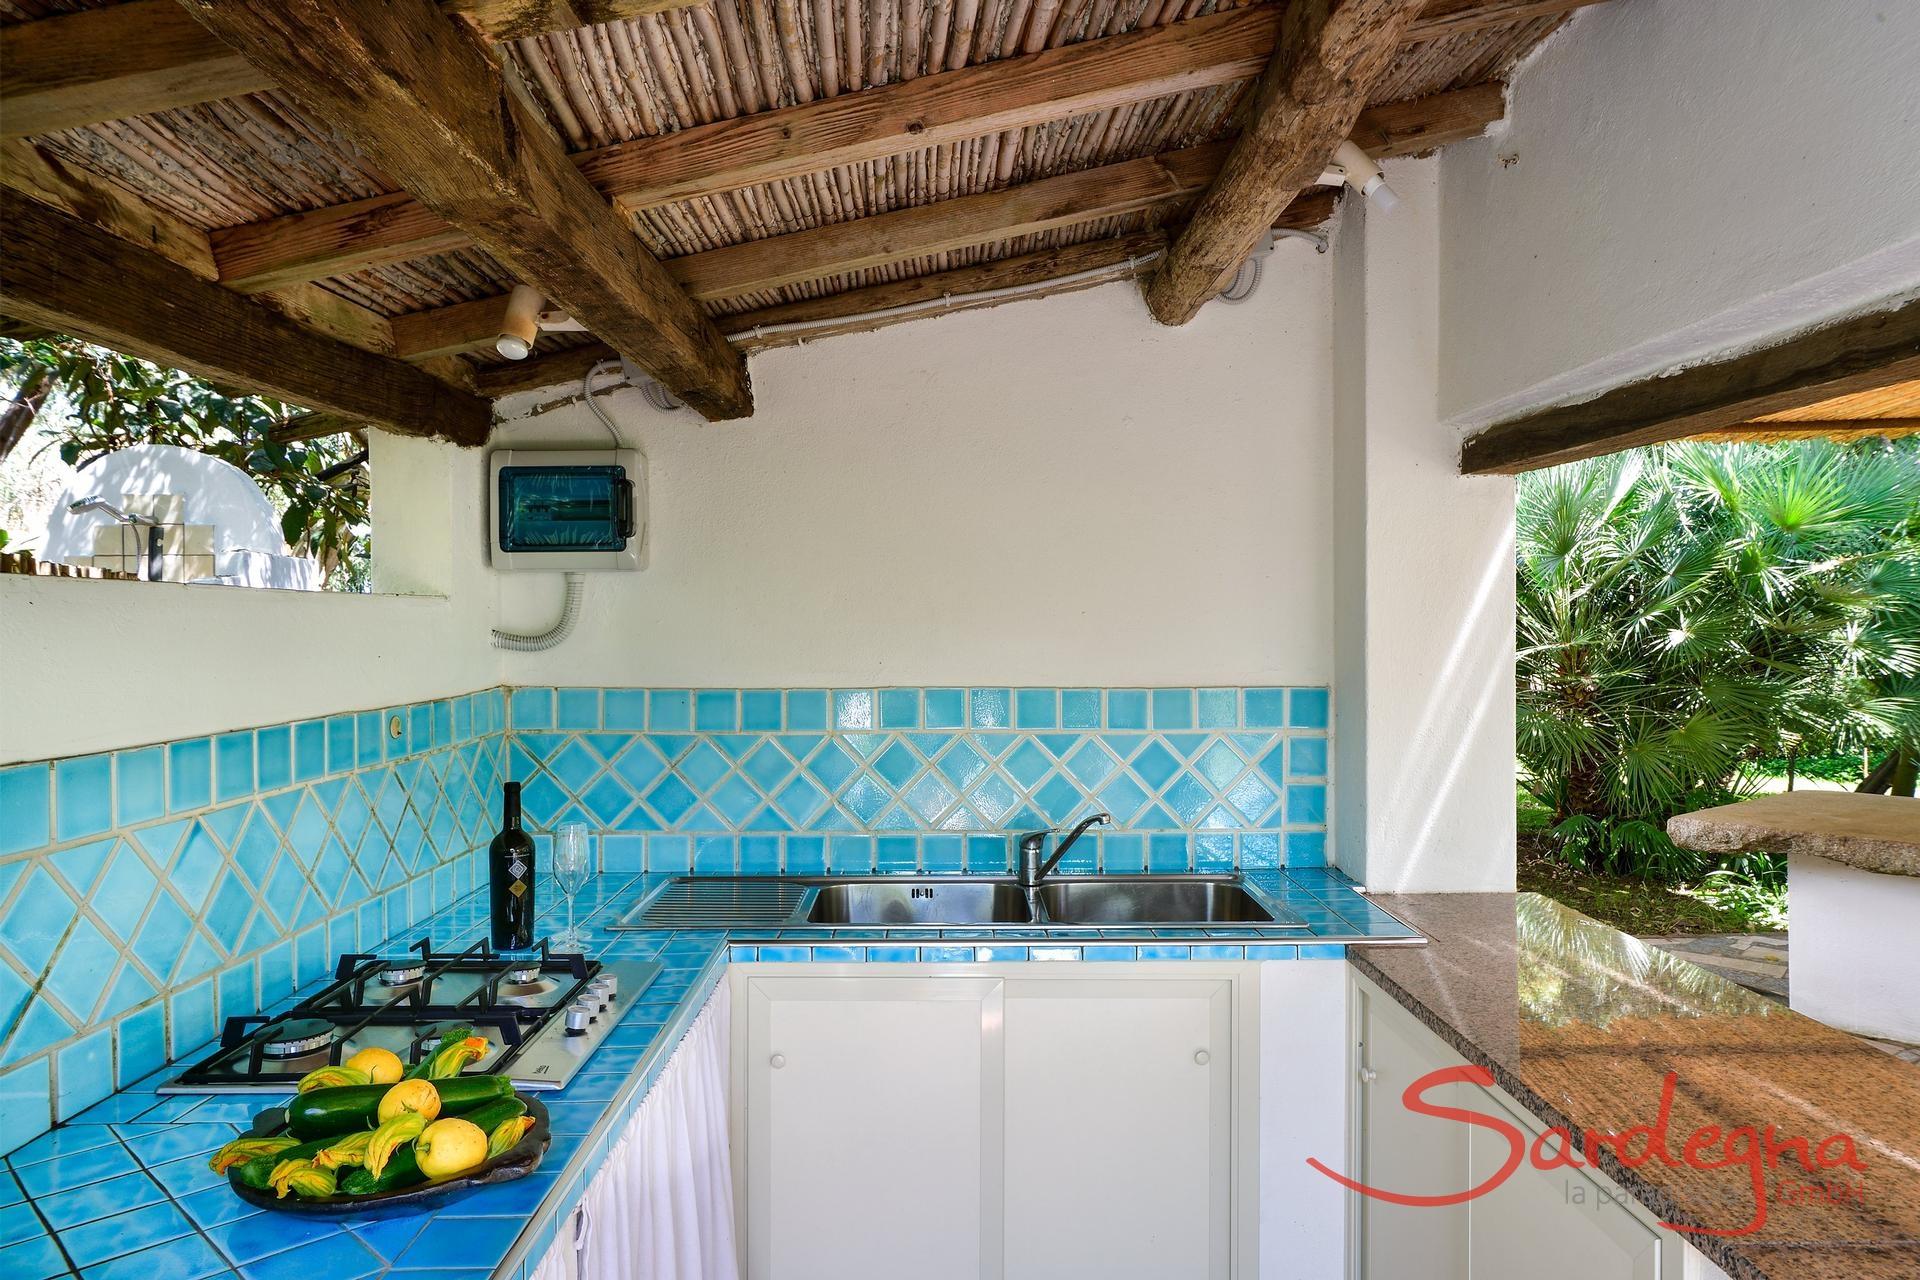 Außenküche Mit Spüle : Außenküche mit spüle außenküche kernig outdoor küche küche und